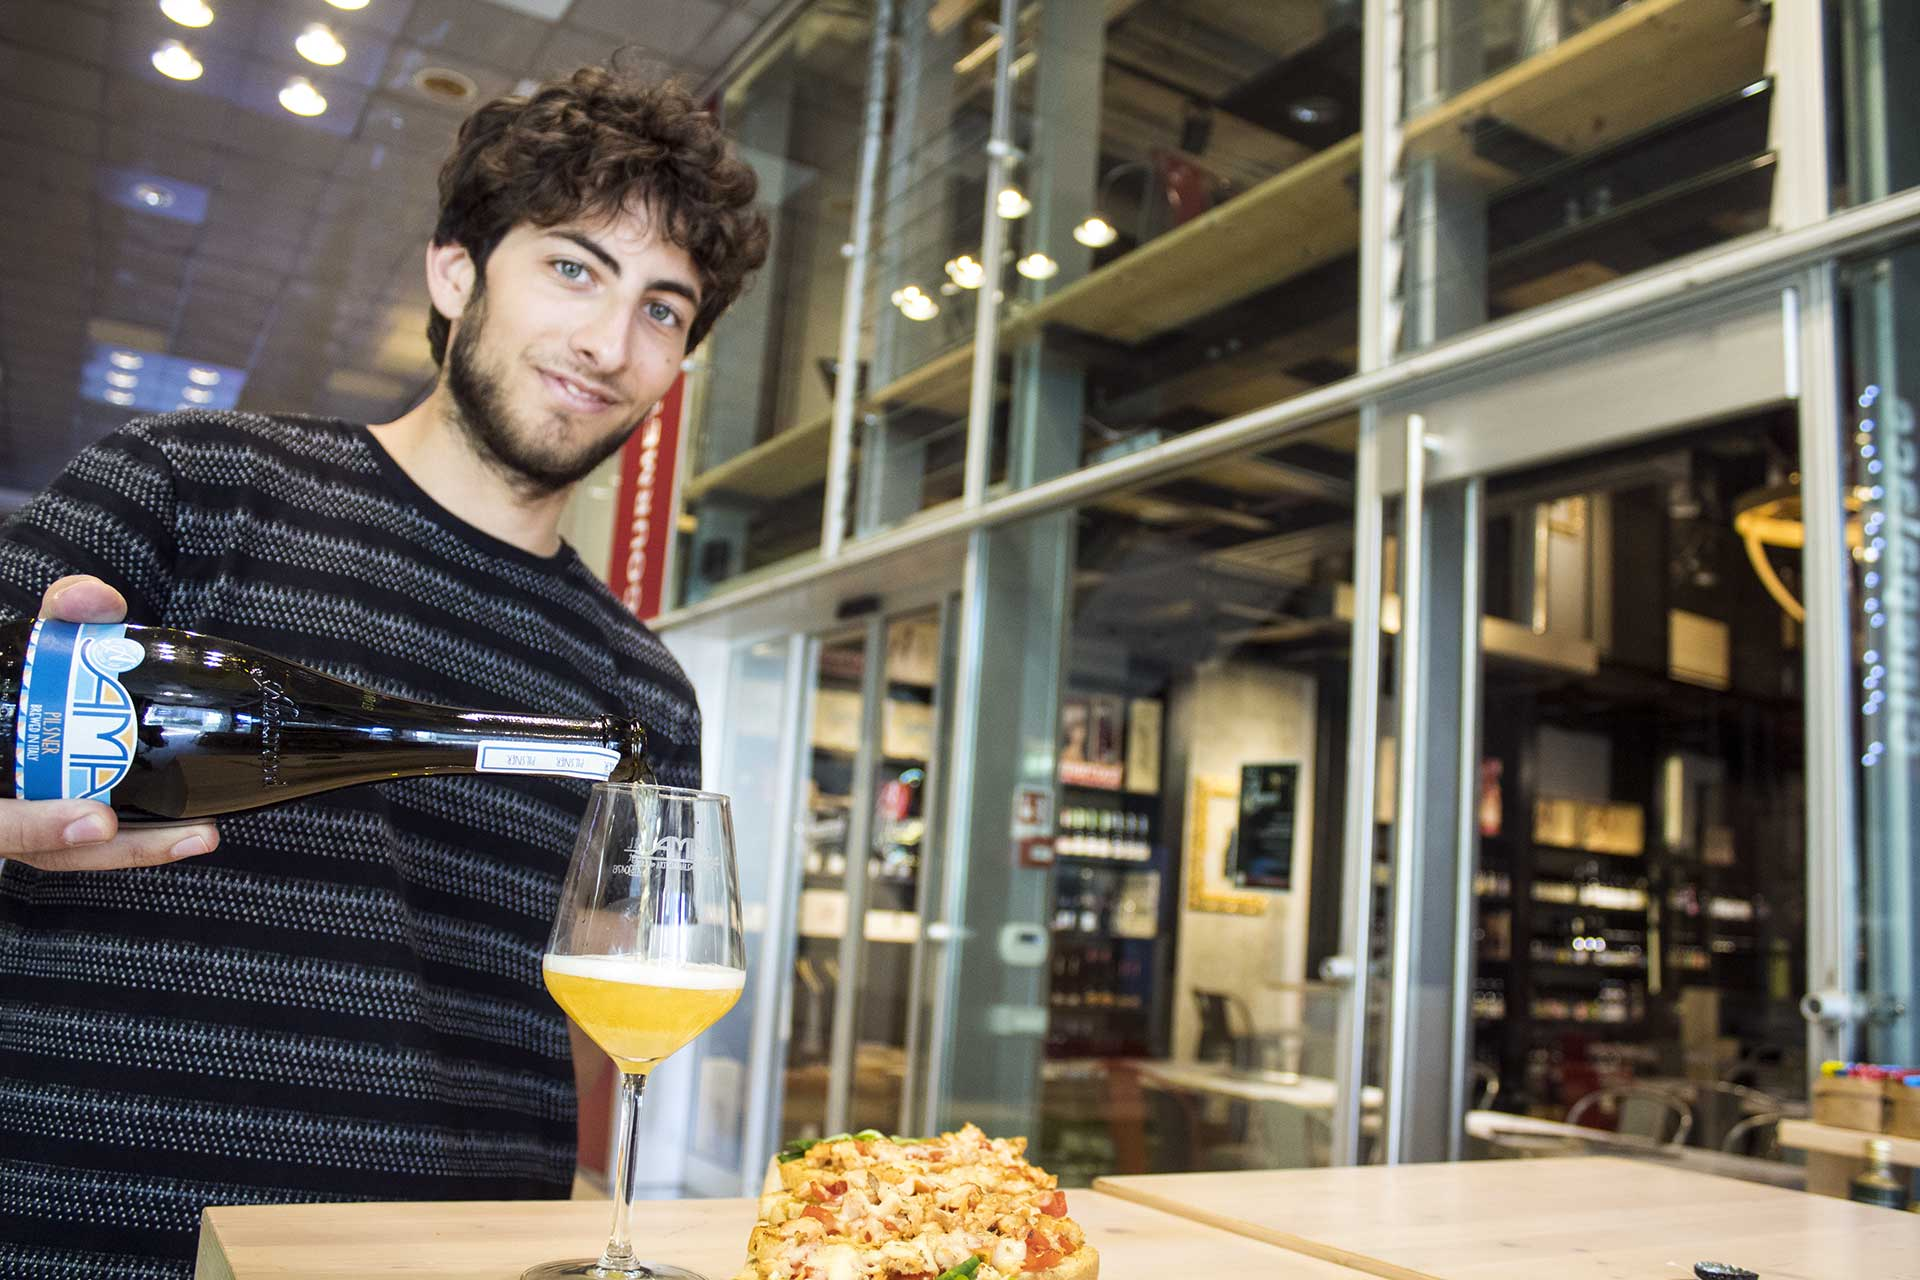 Romagna E Birra Artigianale – Quattro Bionde Da Urlo